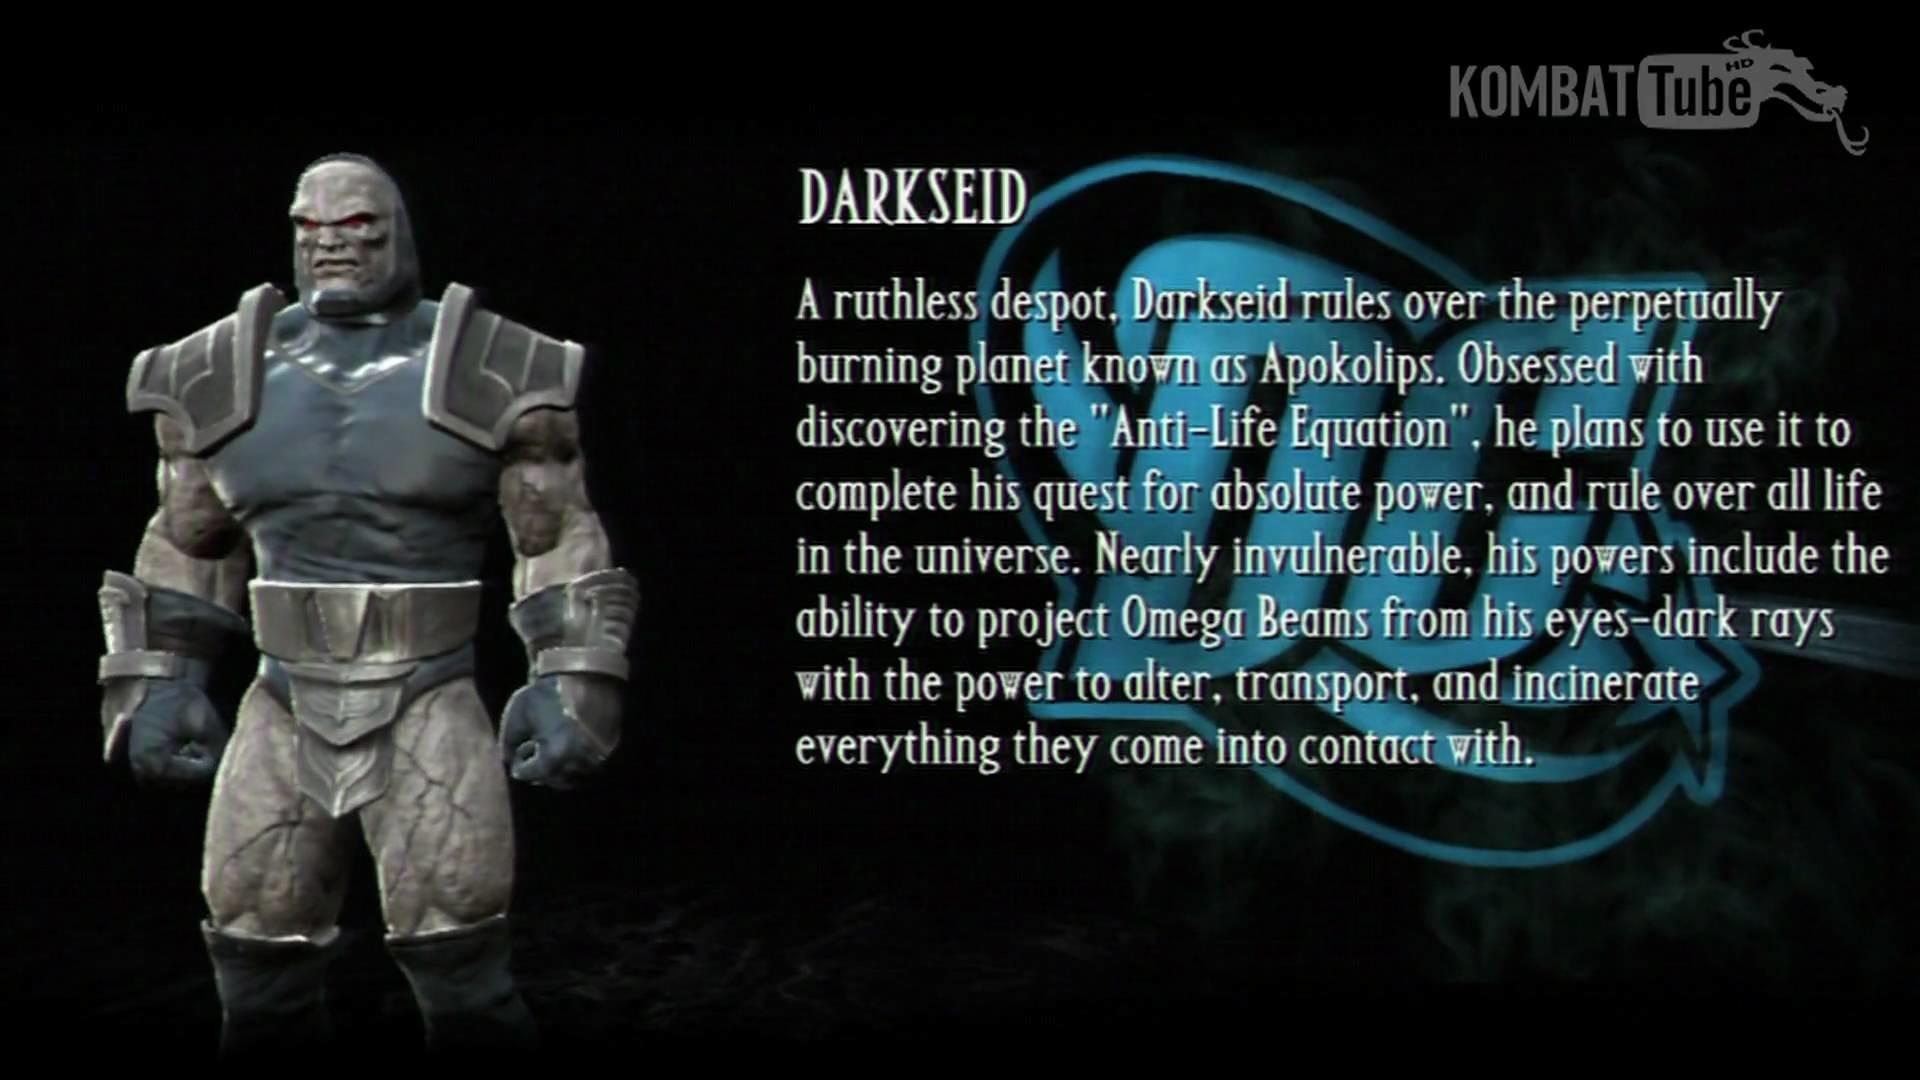 MKvsDC Bio: DARKSEID